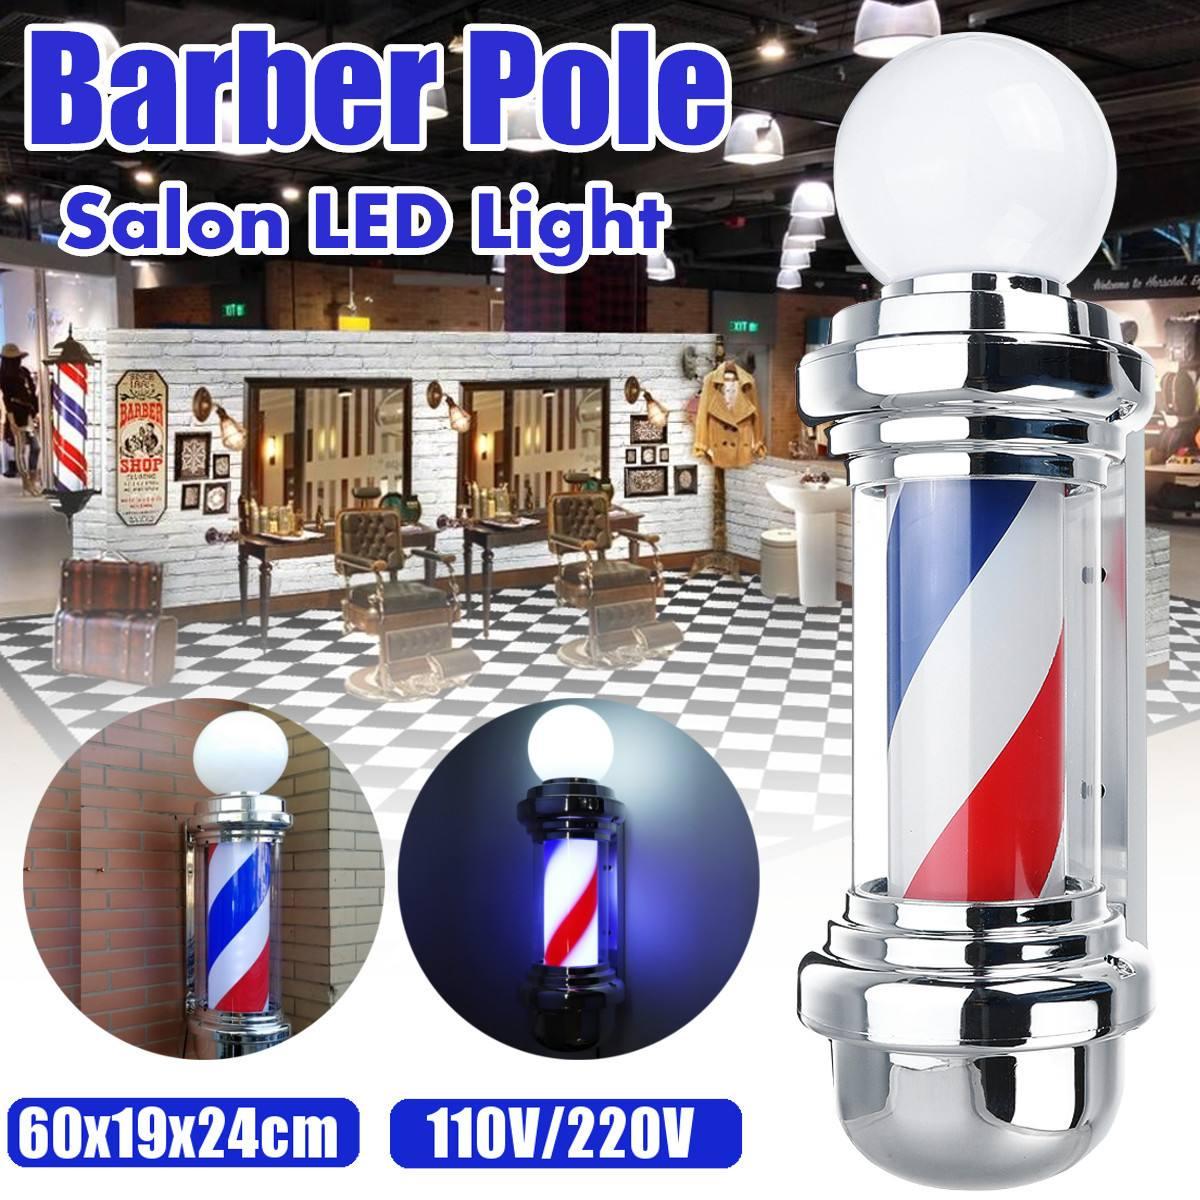 LED Barber Shop Sign Pole Light Red White Blue Stripe Design Roating Salon Wall Hanging Light Lamp Beauty Salon Lamp